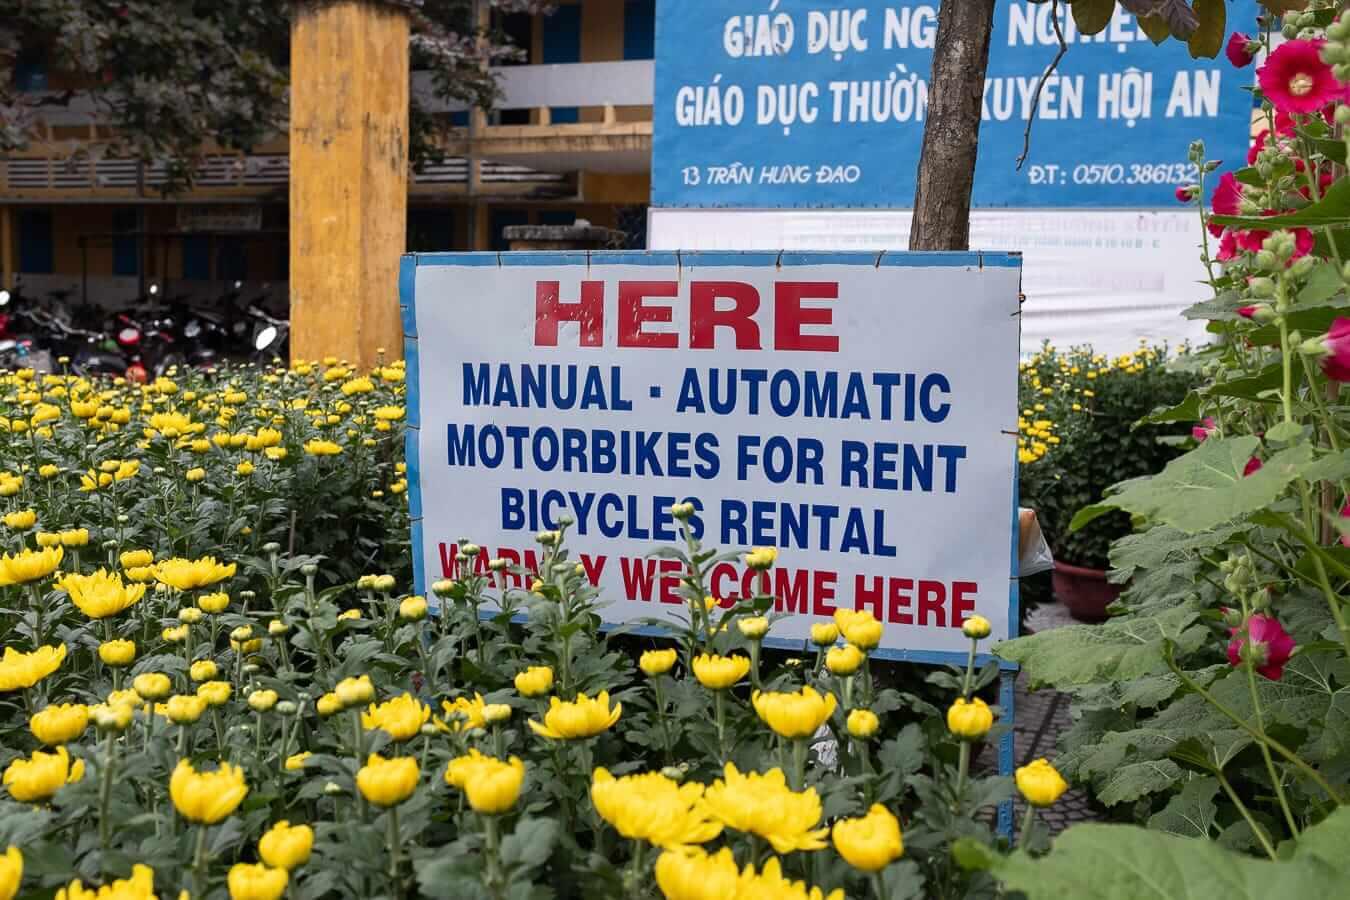 Sign for Vietnam motobike rental